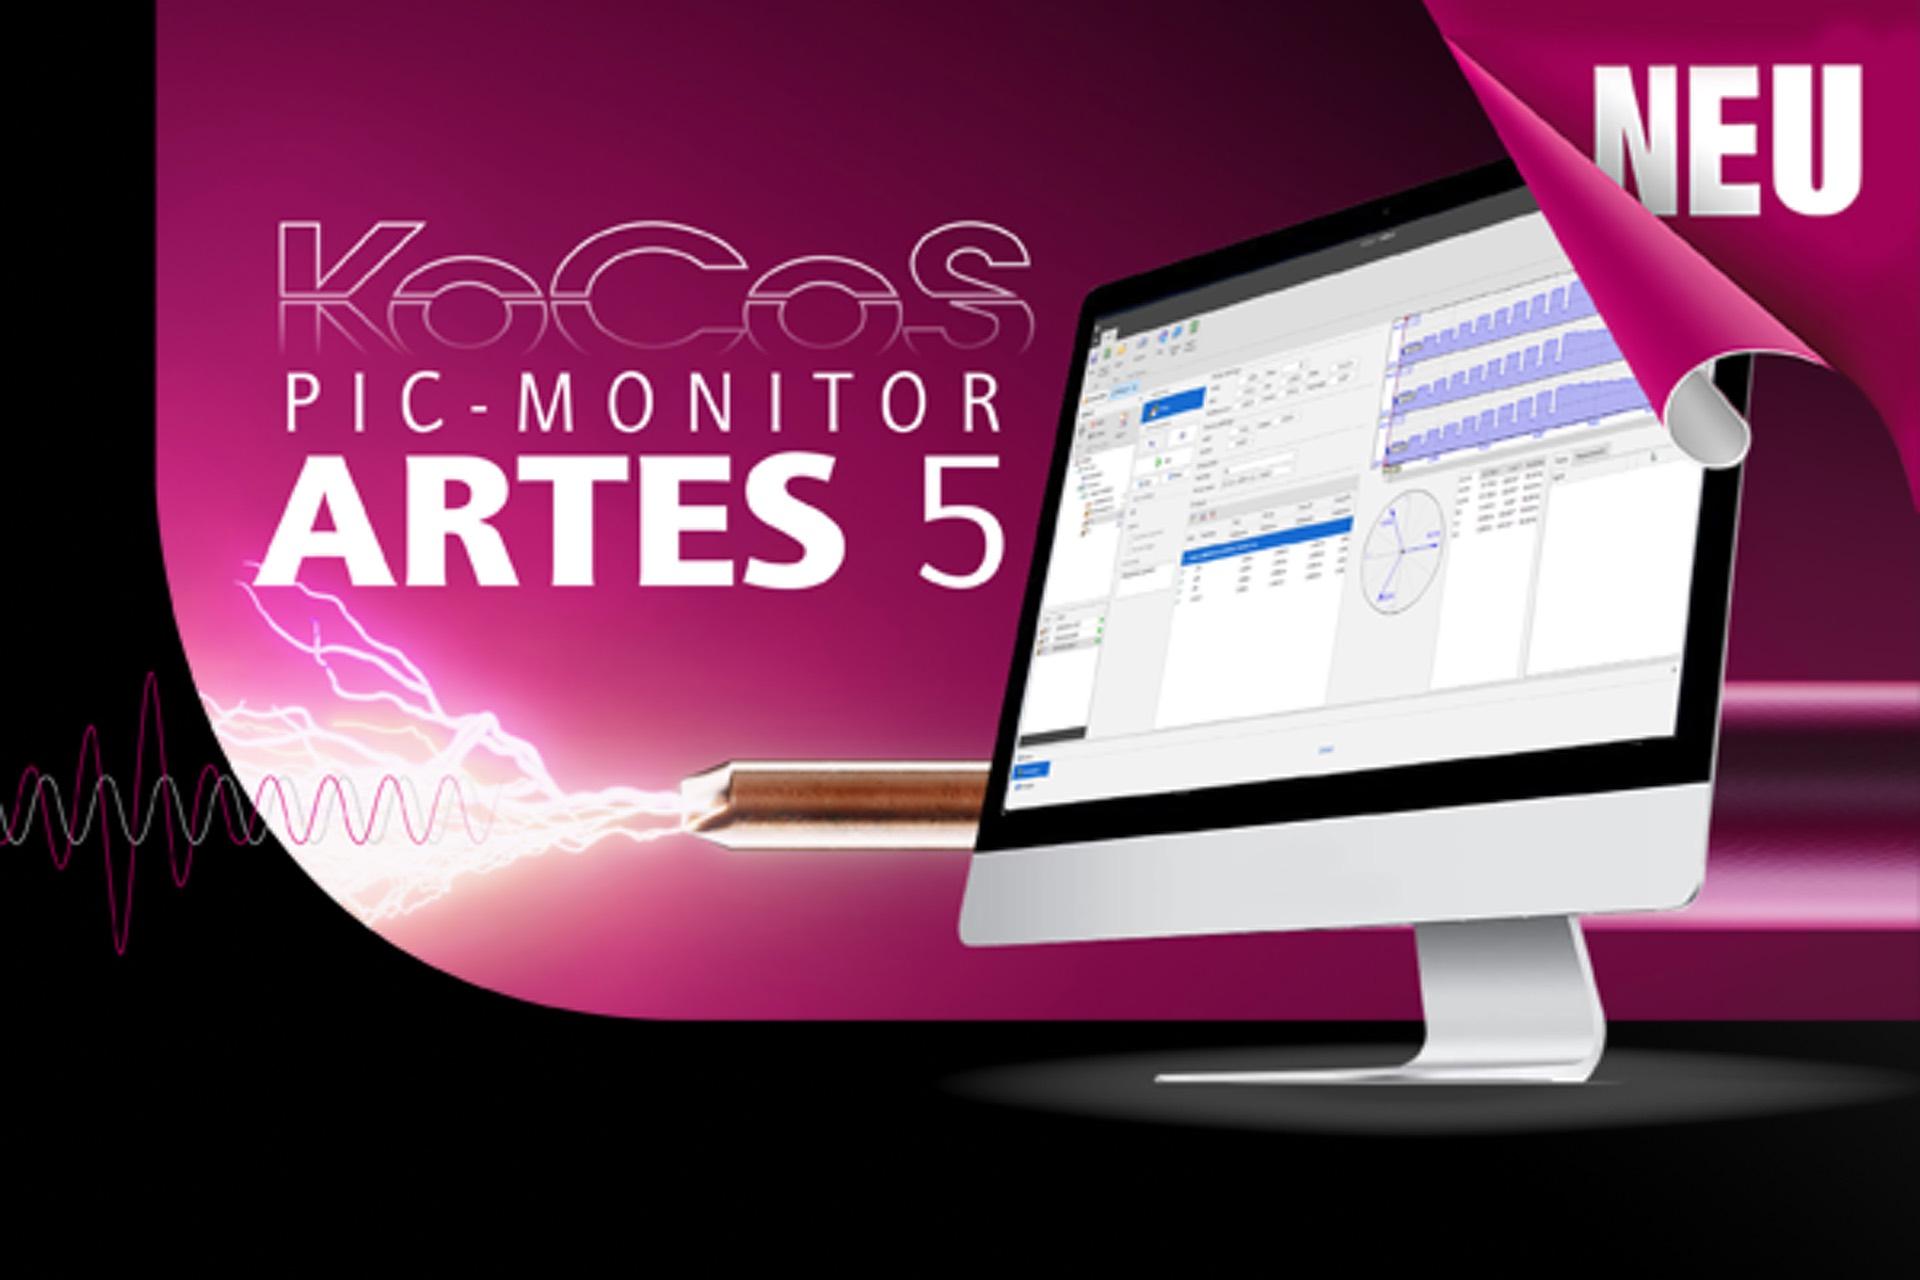 KoCoS ARTES 5 Schutztechnik Prüftechnik Omicron